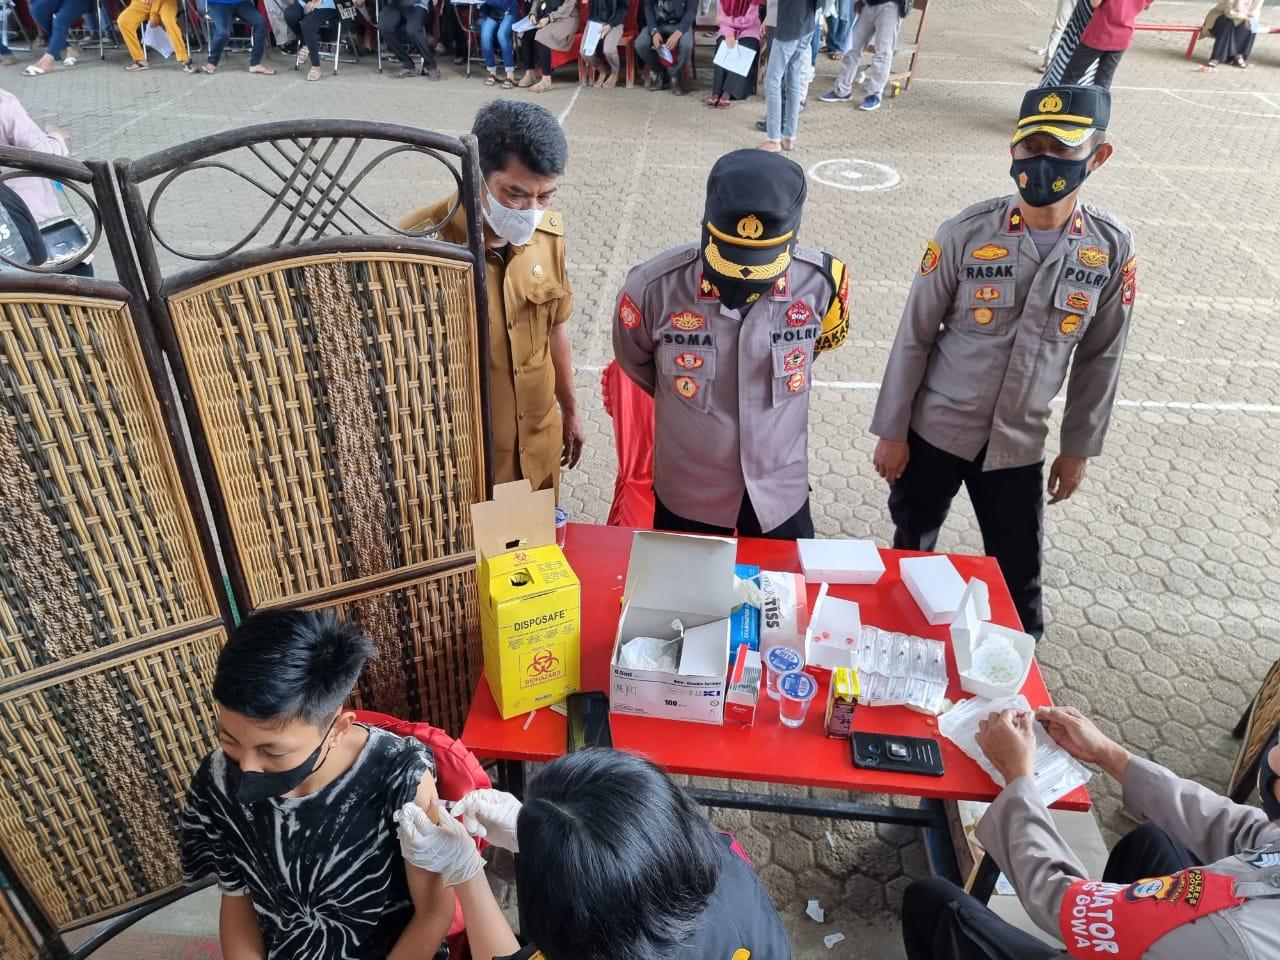 Wakapolres Gowa Tinjau Kegiatan Vaksin di Mesjid Cheng Hoo Gowa